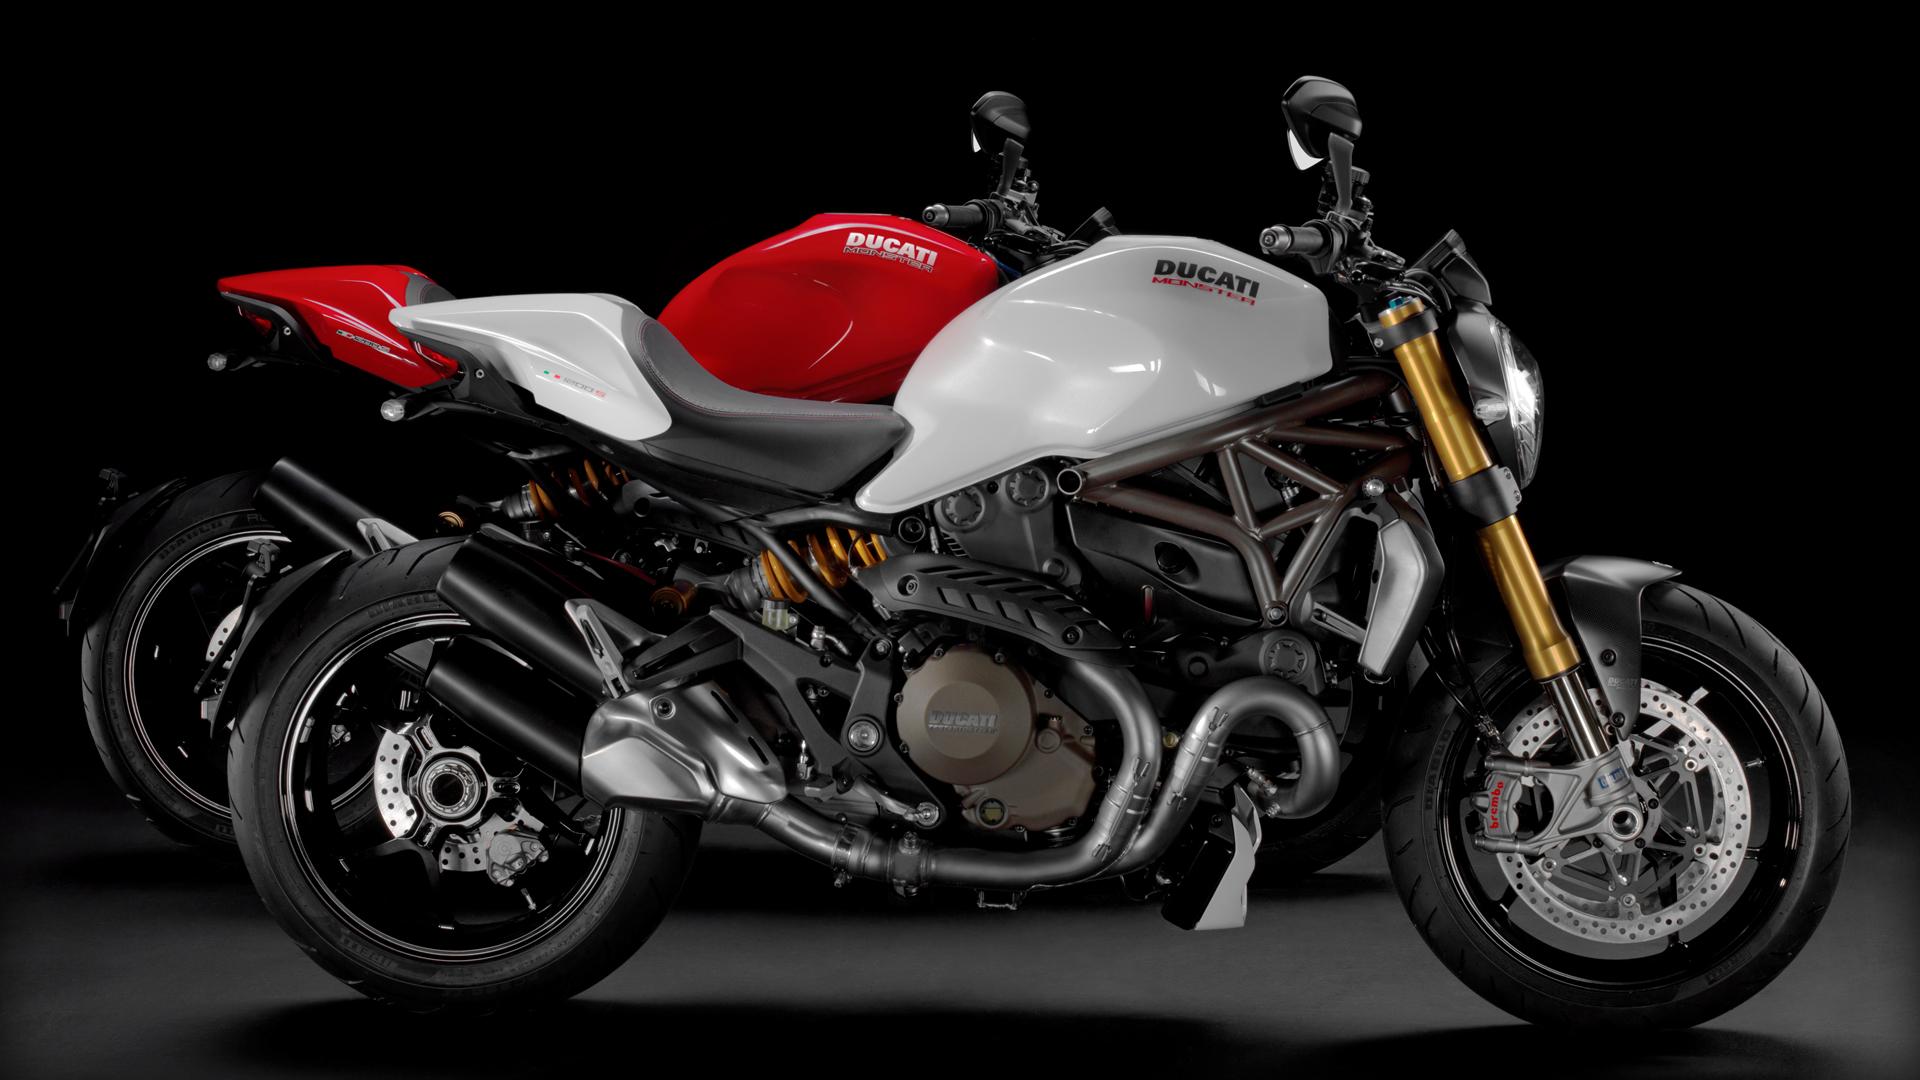 2014 Ducati  | Ducati Monster 1200 S